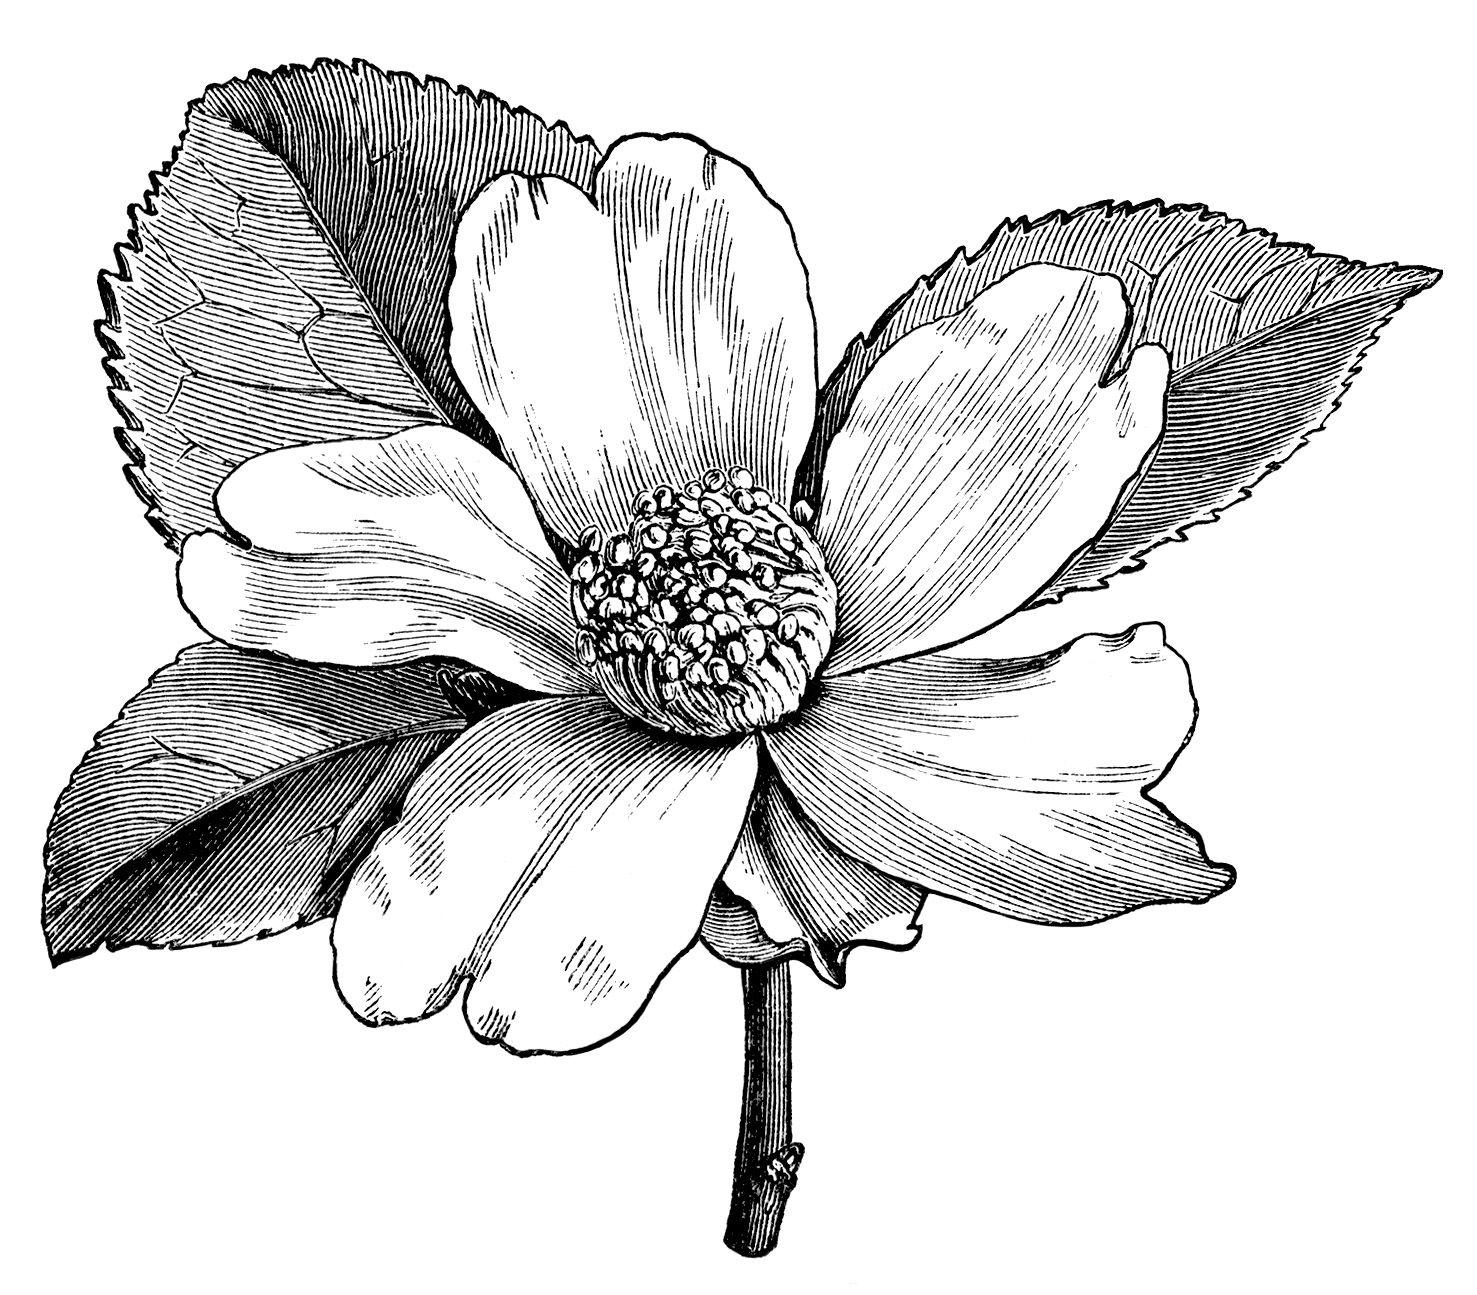 Camellia oleifera camellia flower illustration black and white camellia oleifera camellia flower illustration black and white clip art vintage flower clipart floral graphics free mightylinksfo